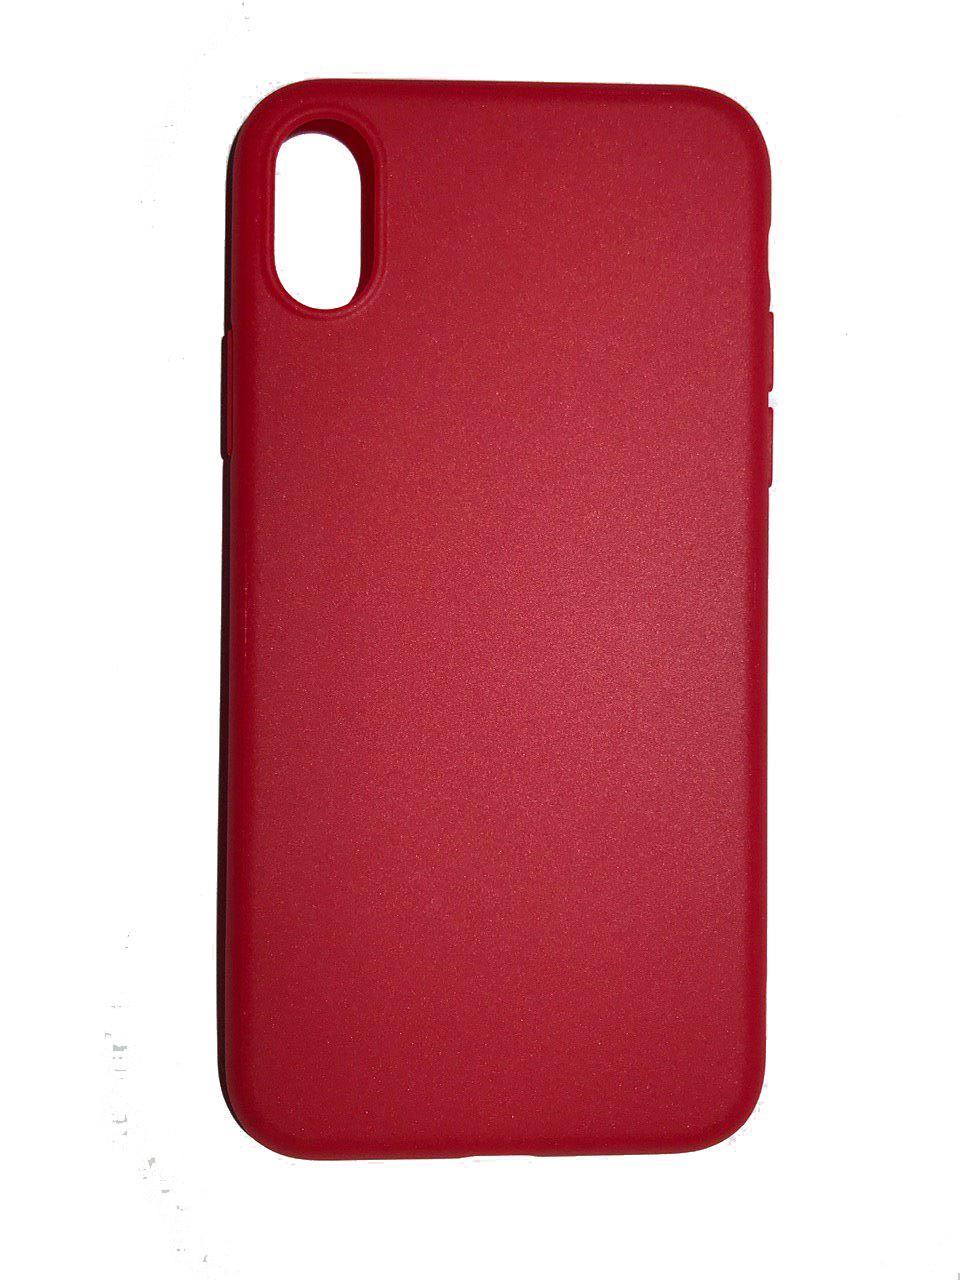 Чехол для сотового телефона Benks Чехол for iPhone X силикон (Red), красный glare free screen protector with cleaning cloth for iphone 3g